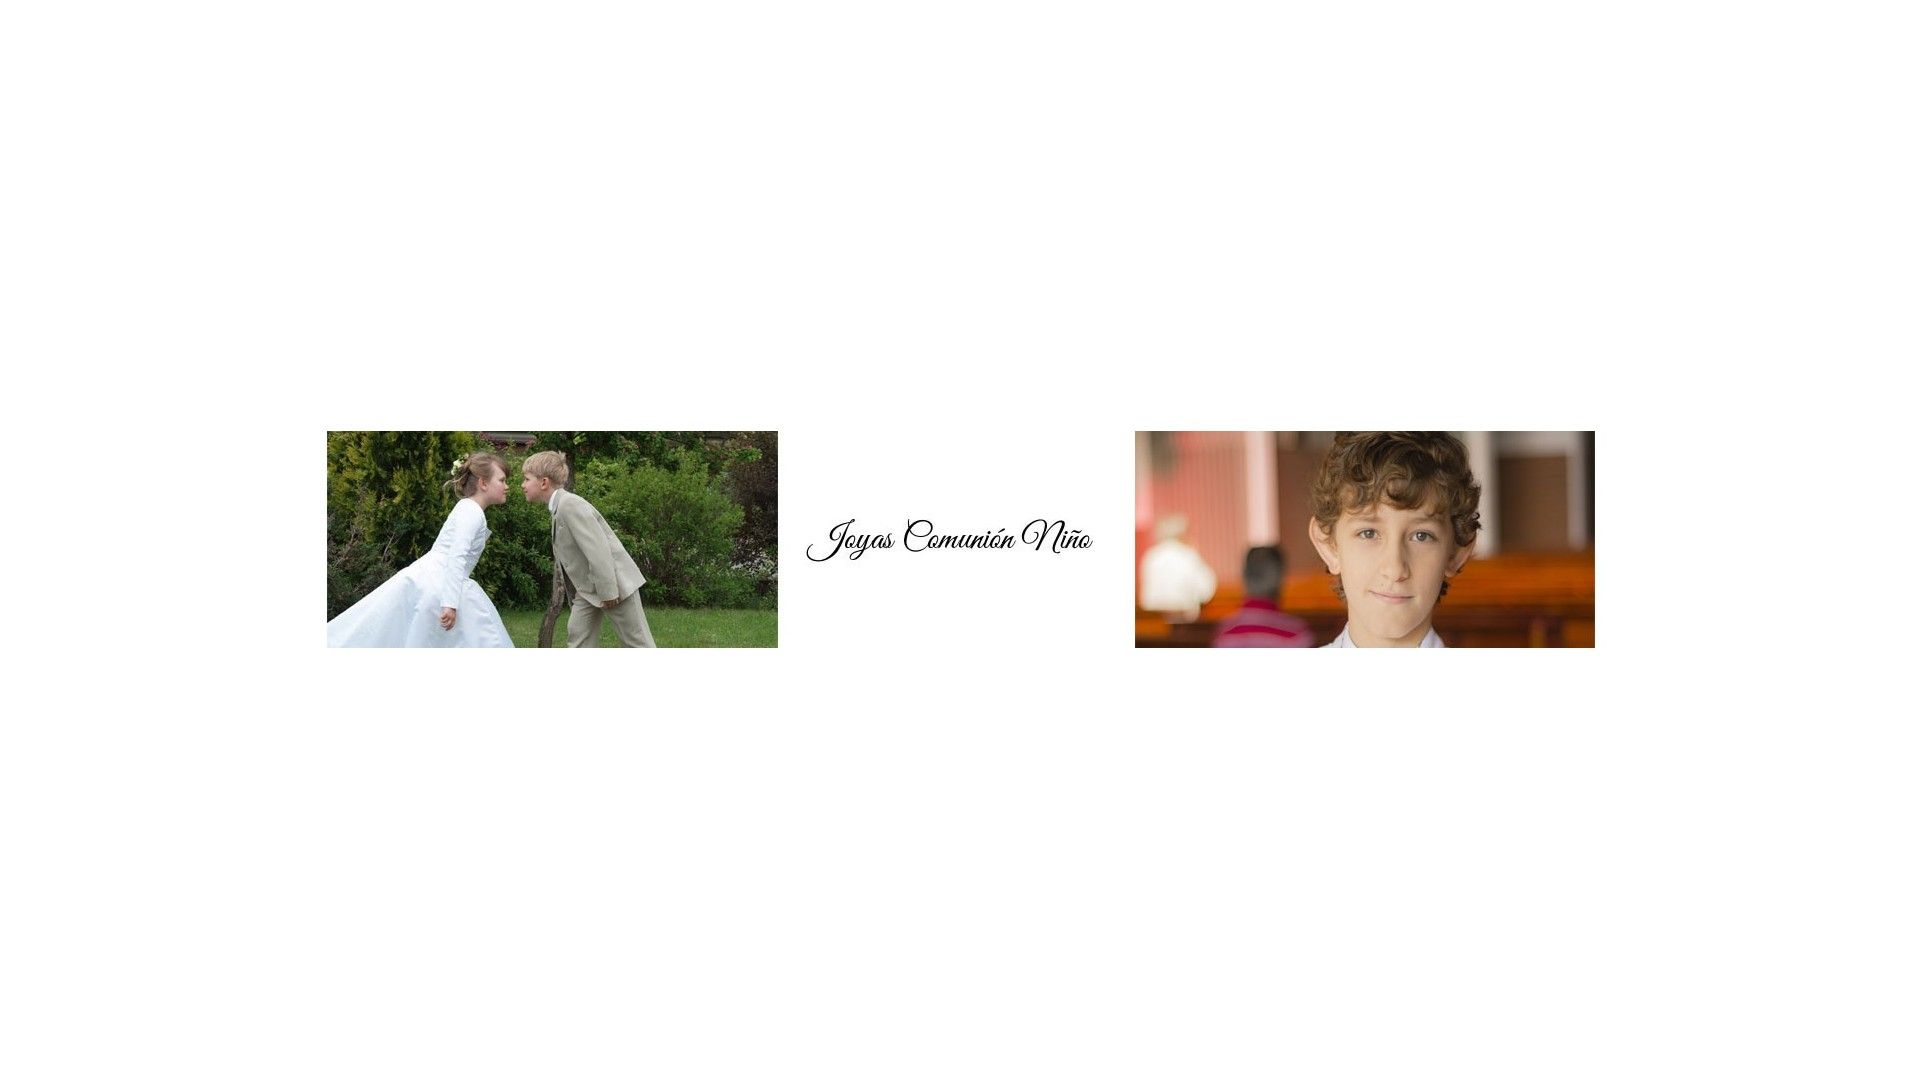 Joyas para niños - Comunión